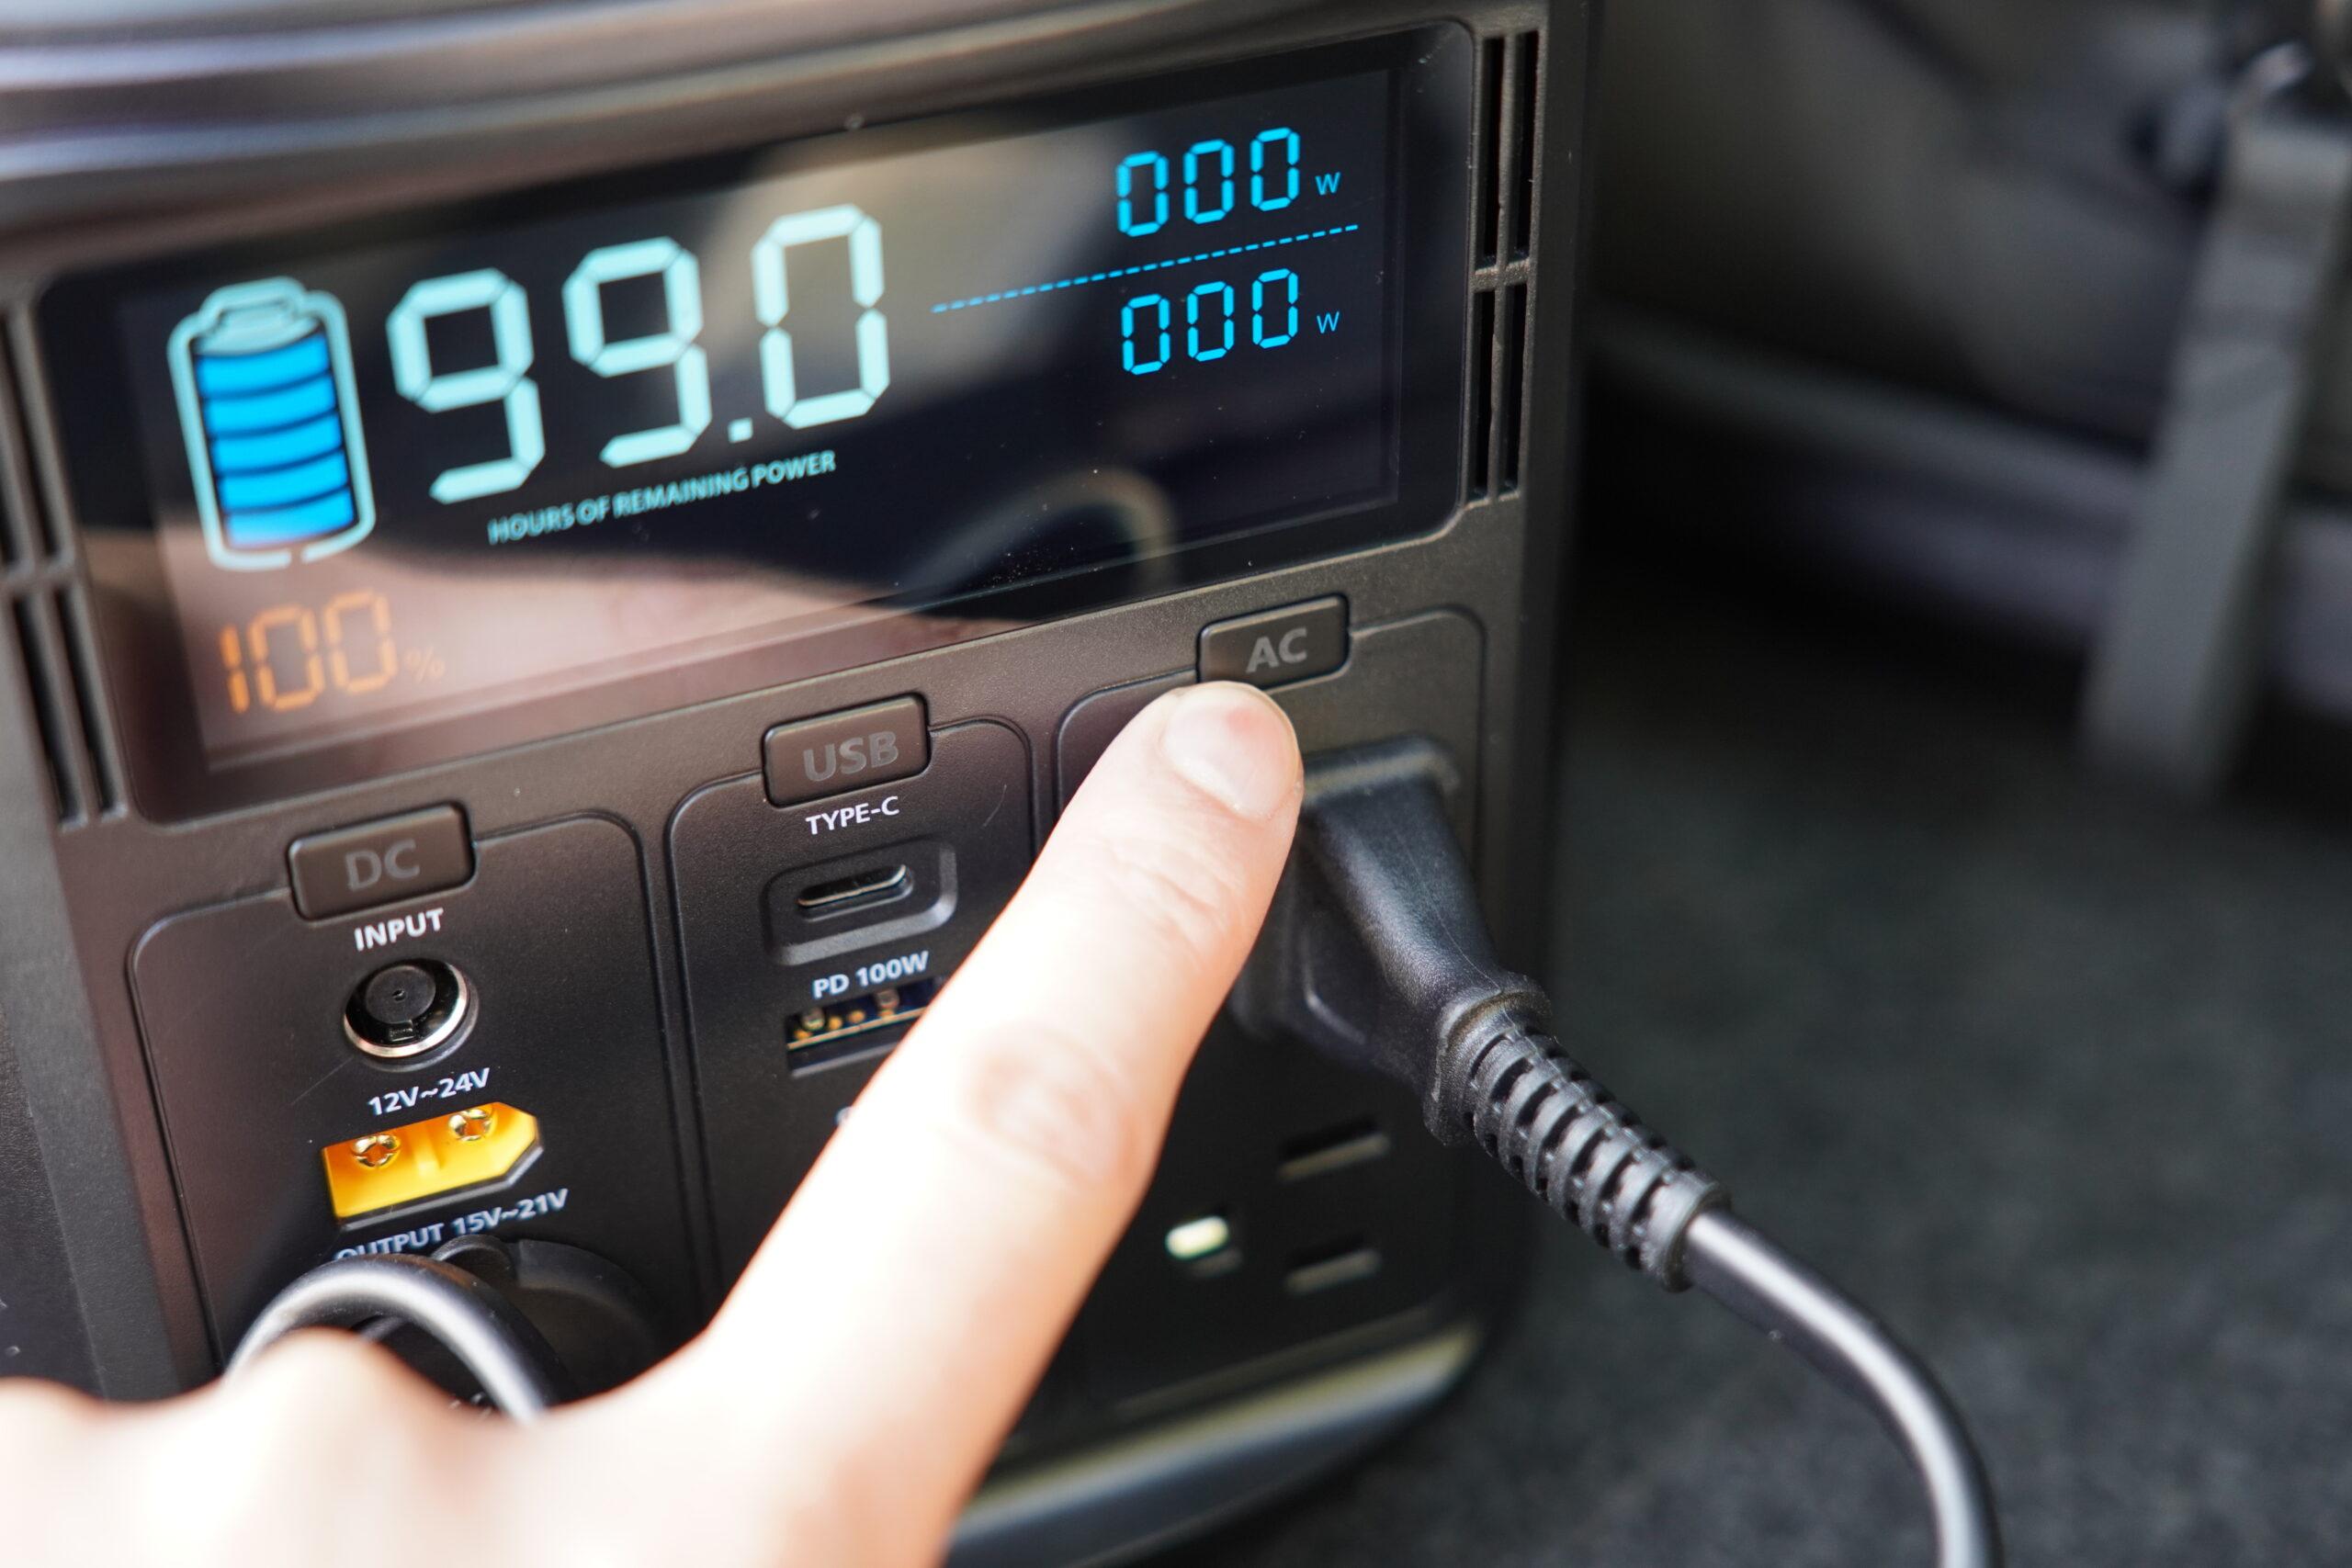 ELECAENTA S600W ドローン充電